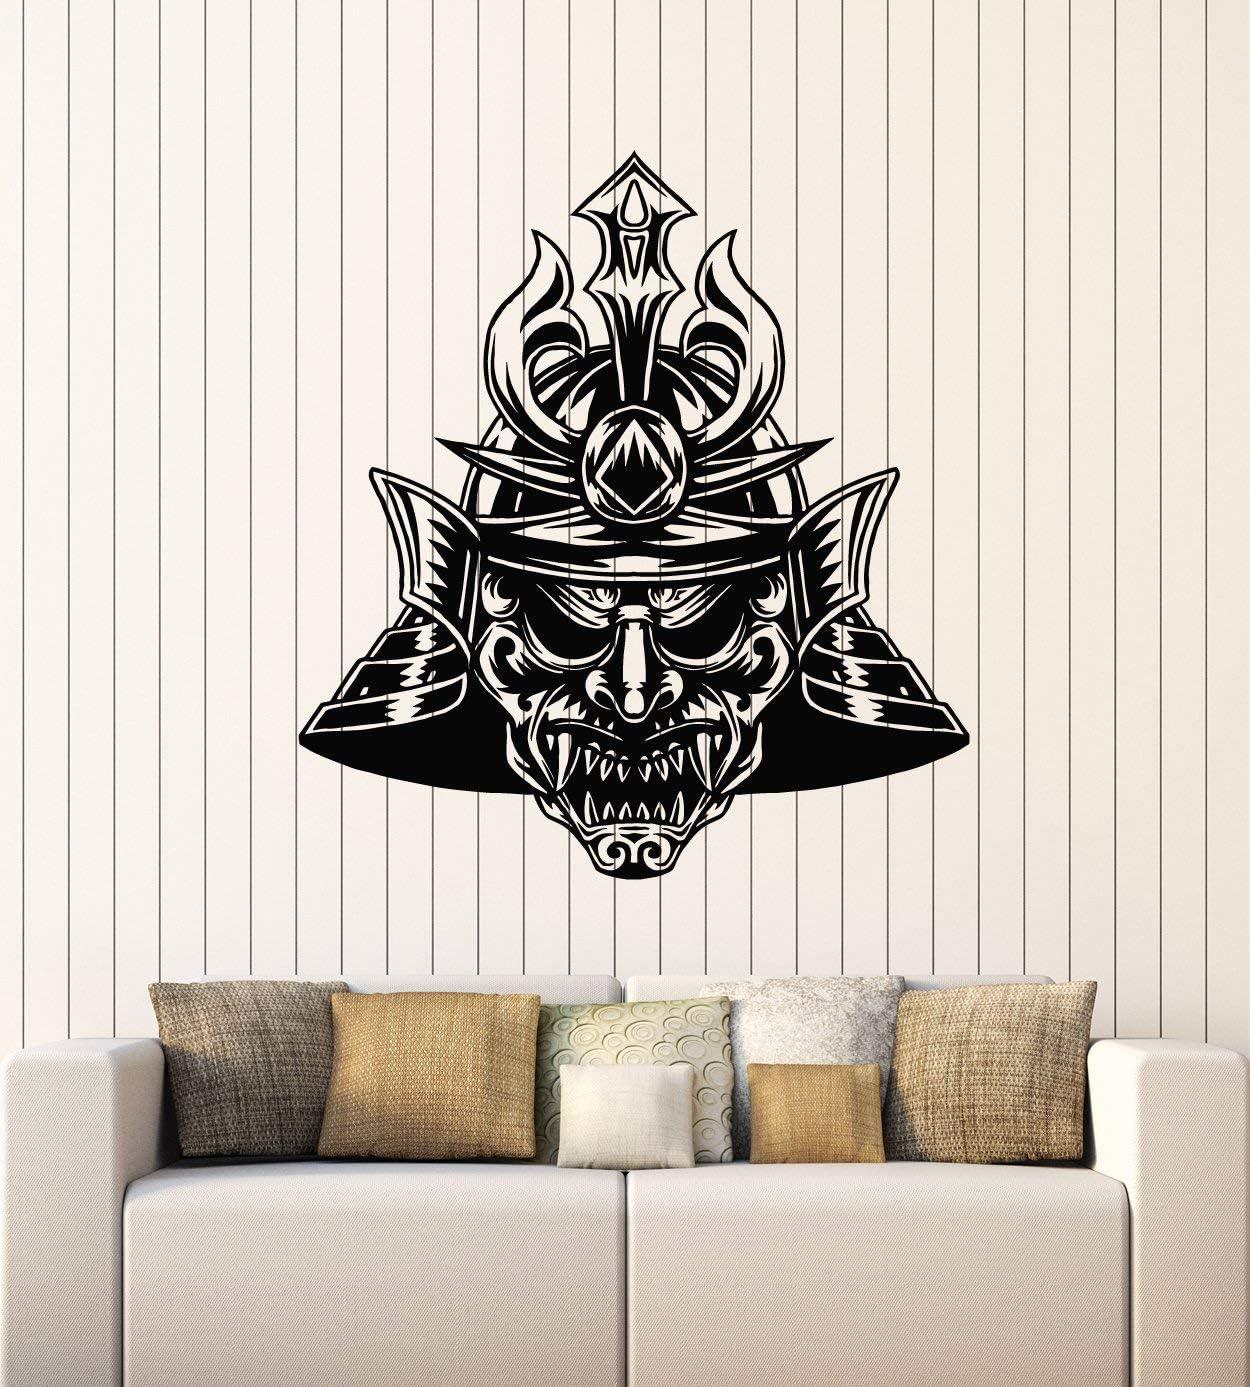 Vinyl Wall Decal Asian Helmet Japanese Samurai Mask Warrior Stickers Mural Large Decor (g2793) Black